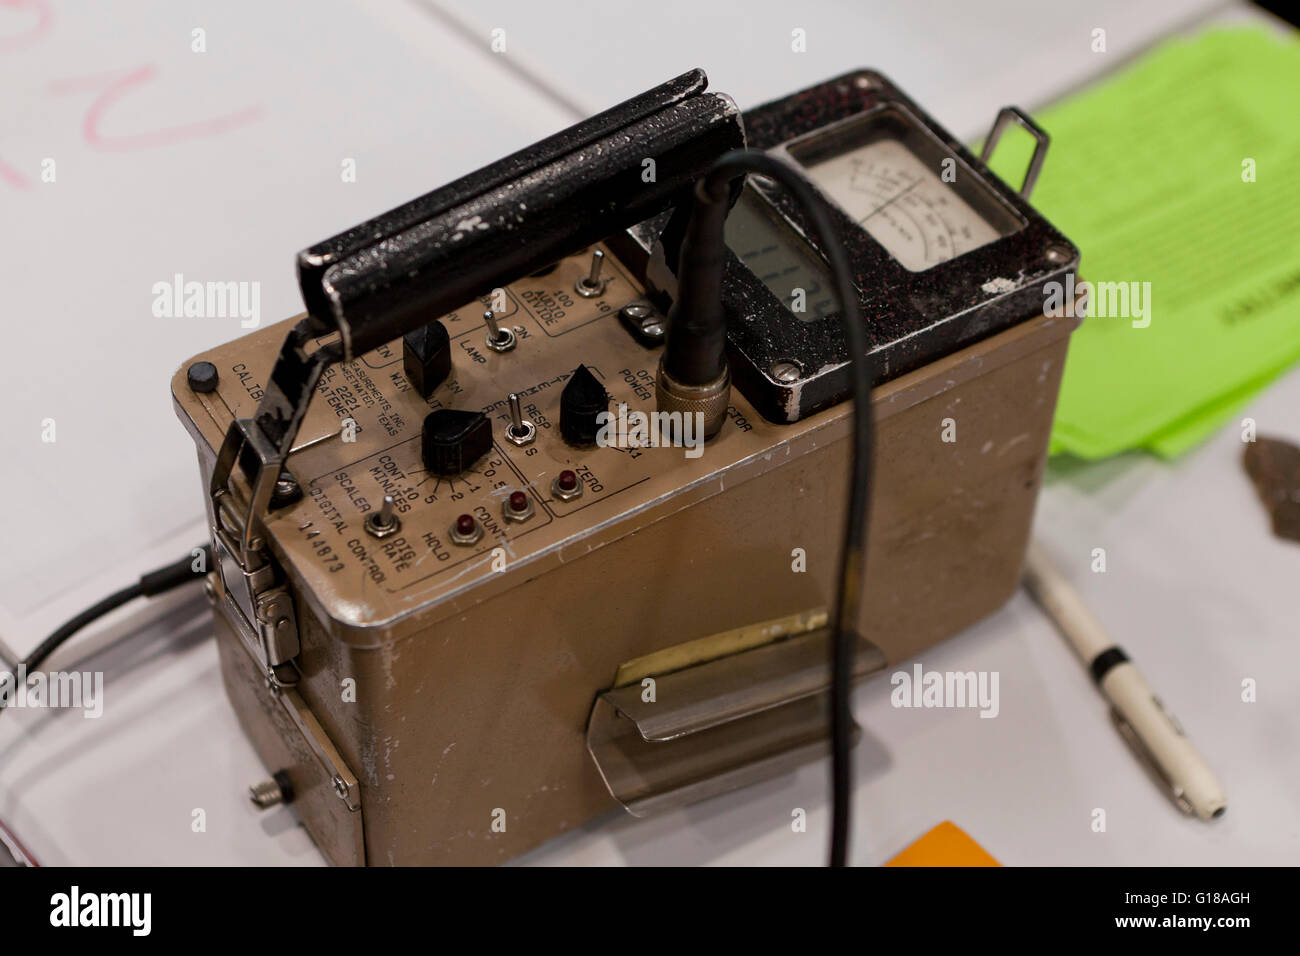 Vintage Ludium Model 2221 Radiation Scaler Ratemeter (Geiger counter) - USA - Stock Image